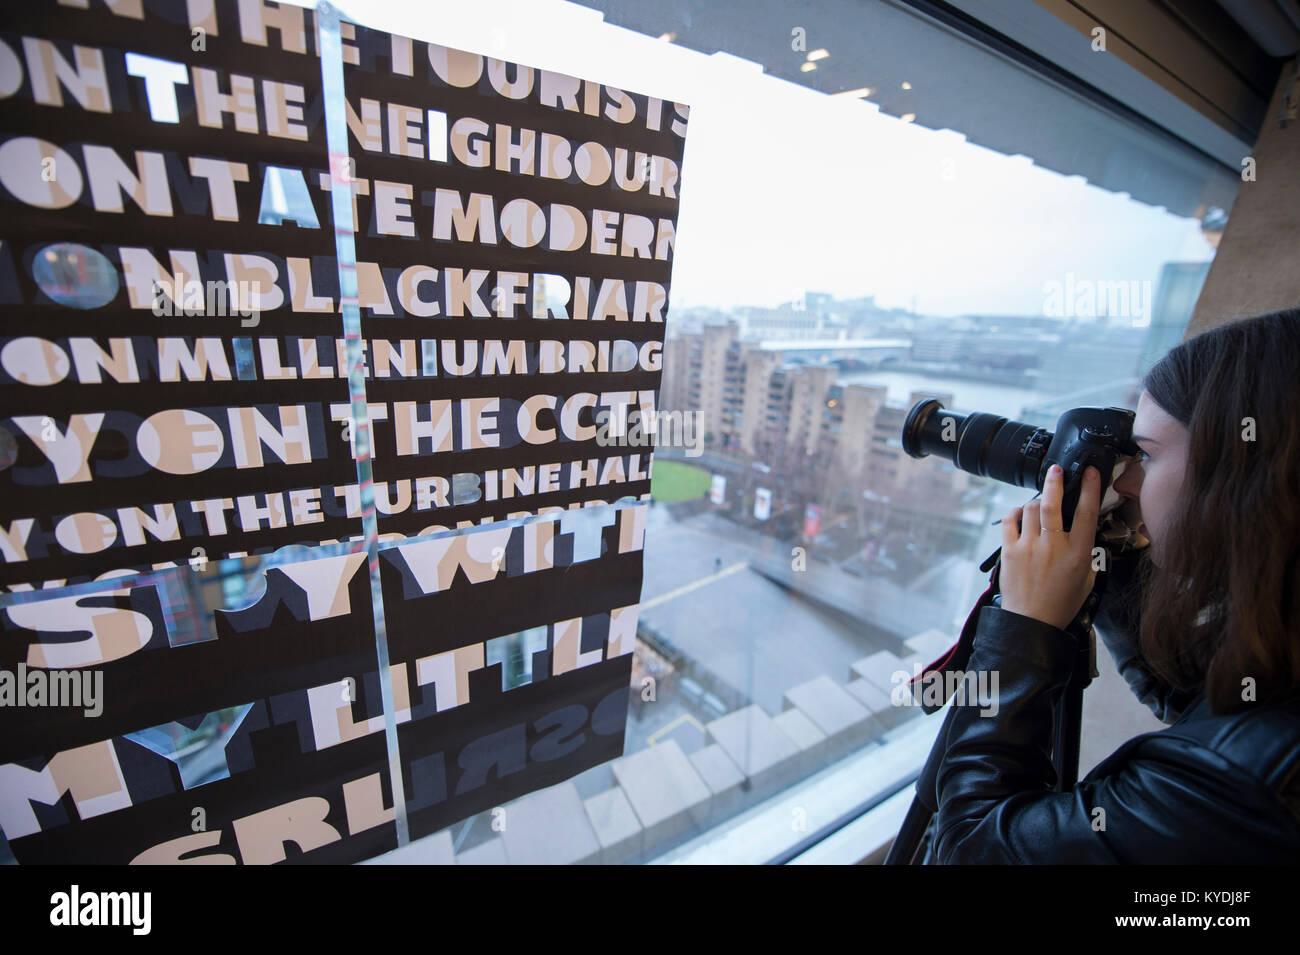 Tate Modern, London, UK  15th Jan, 2018  Photo: Caroline